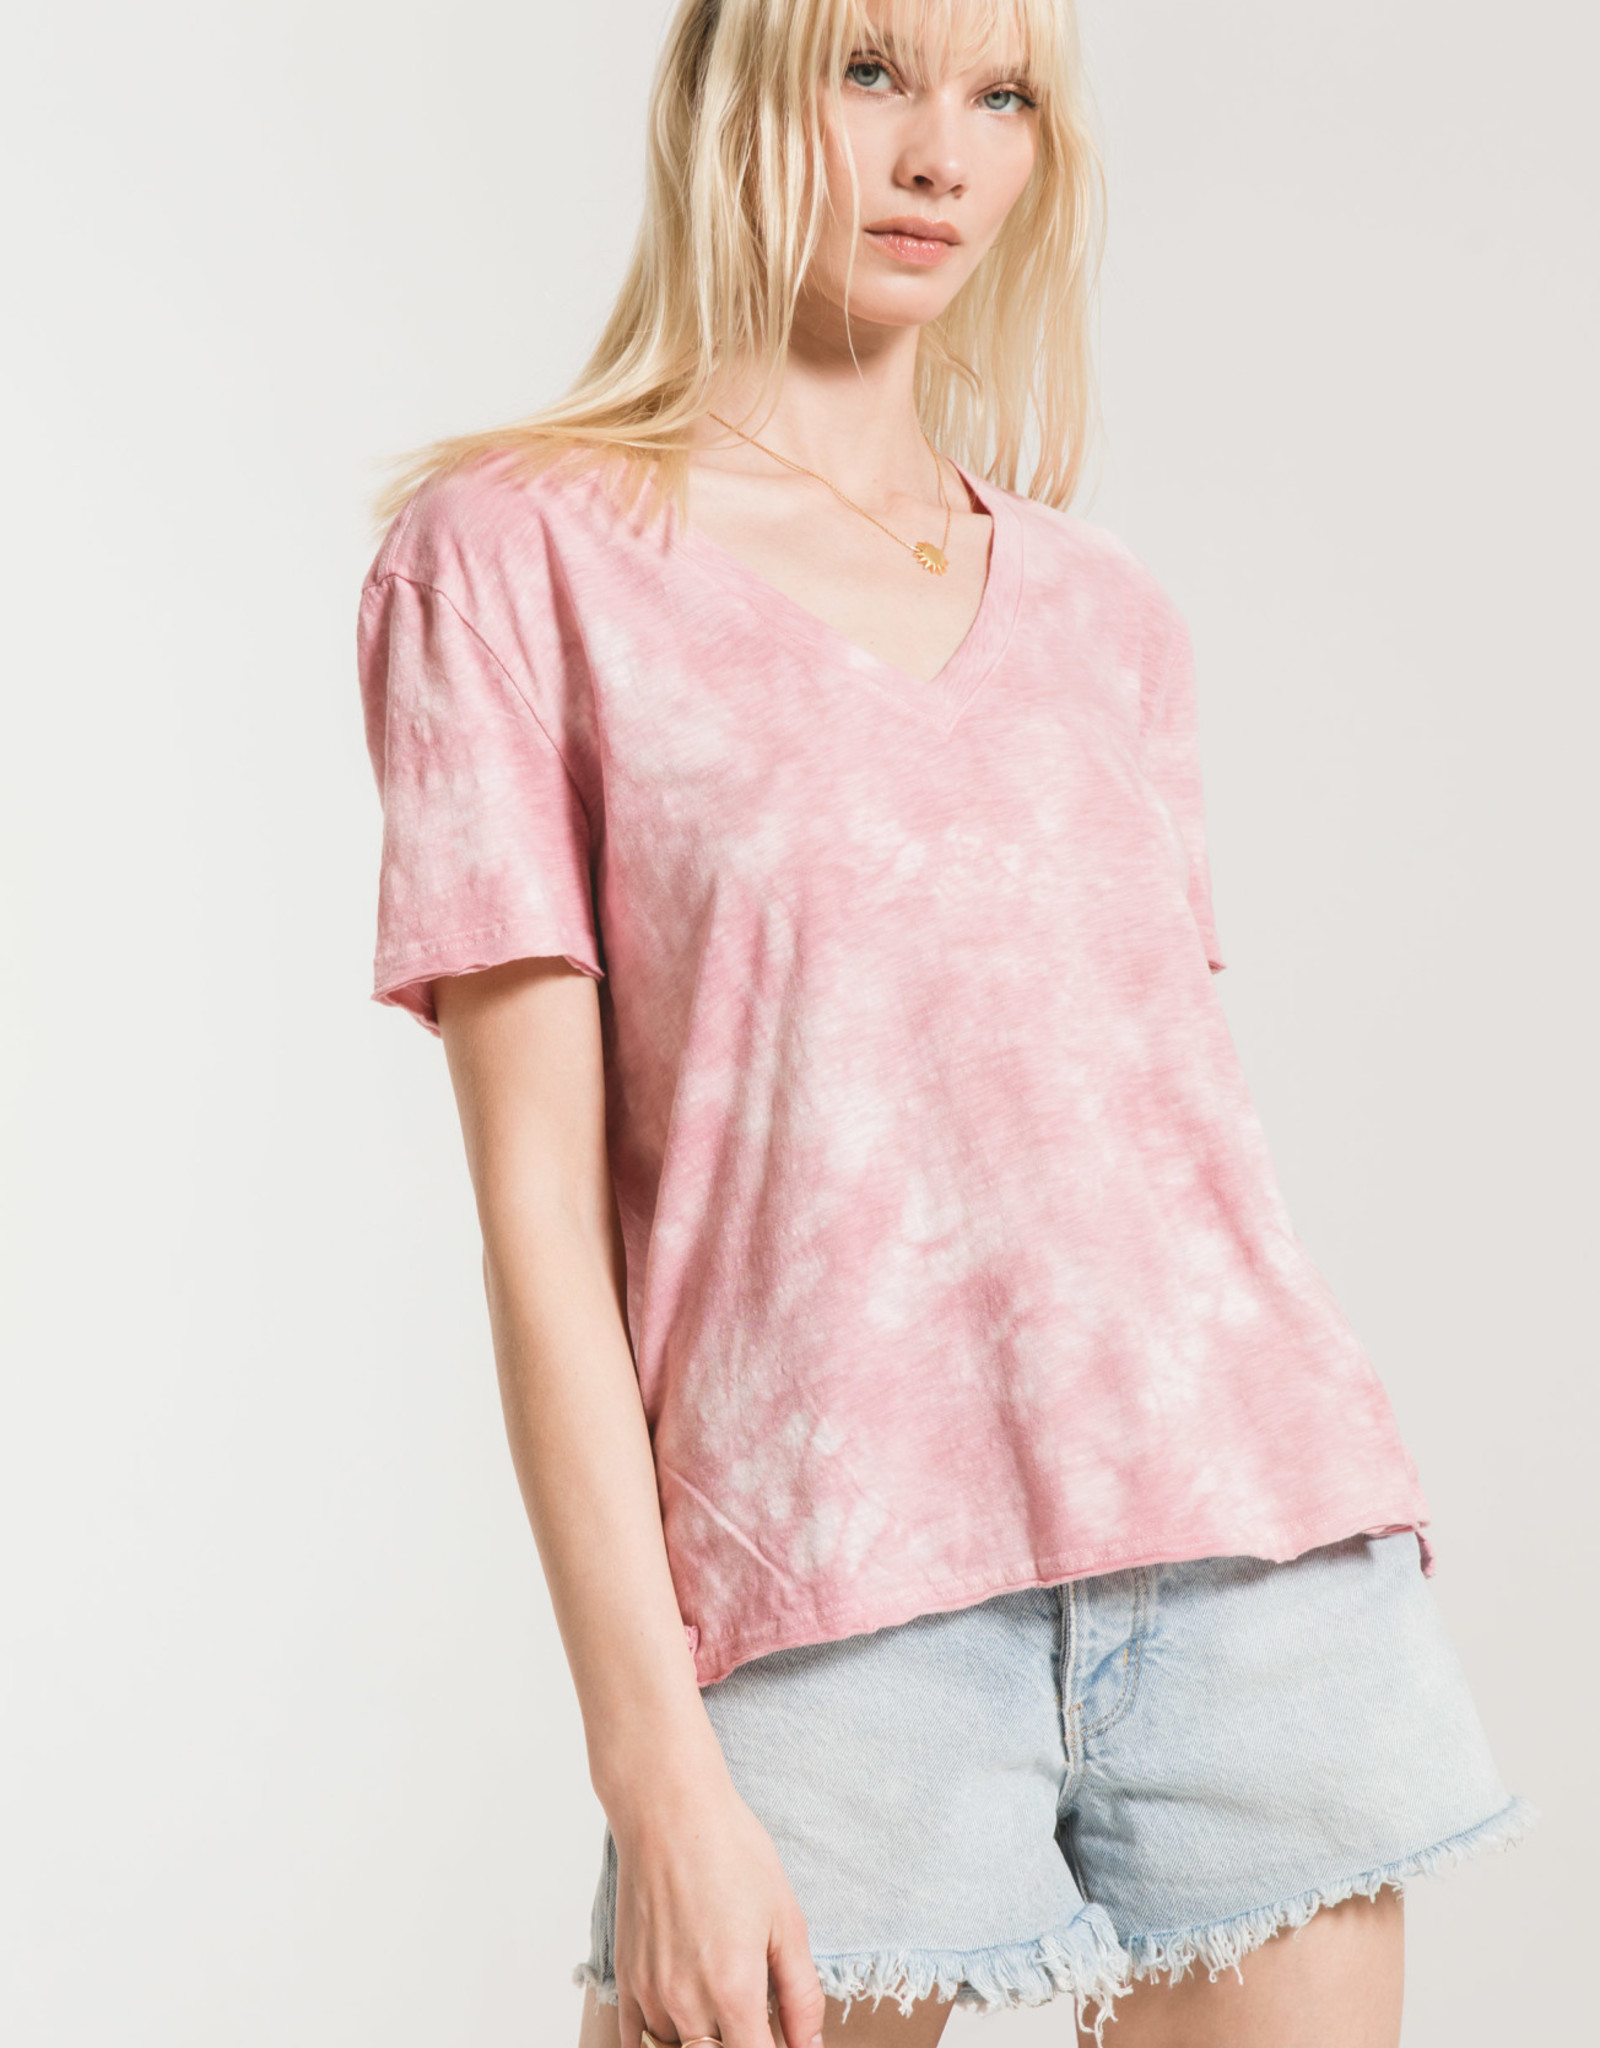 Z Supply Cloud Tie Dye Tee Shirt